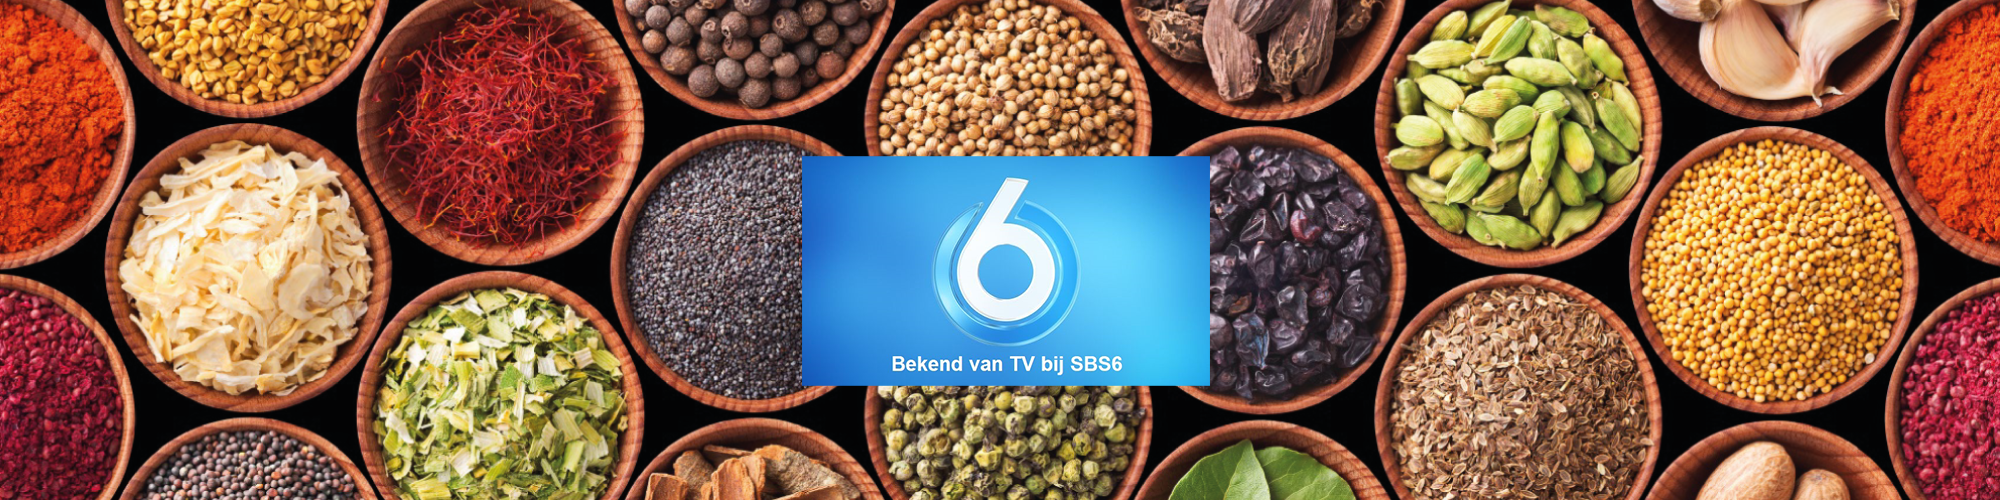 Specerijen en kruiden – Online kruiden kopen banner 1